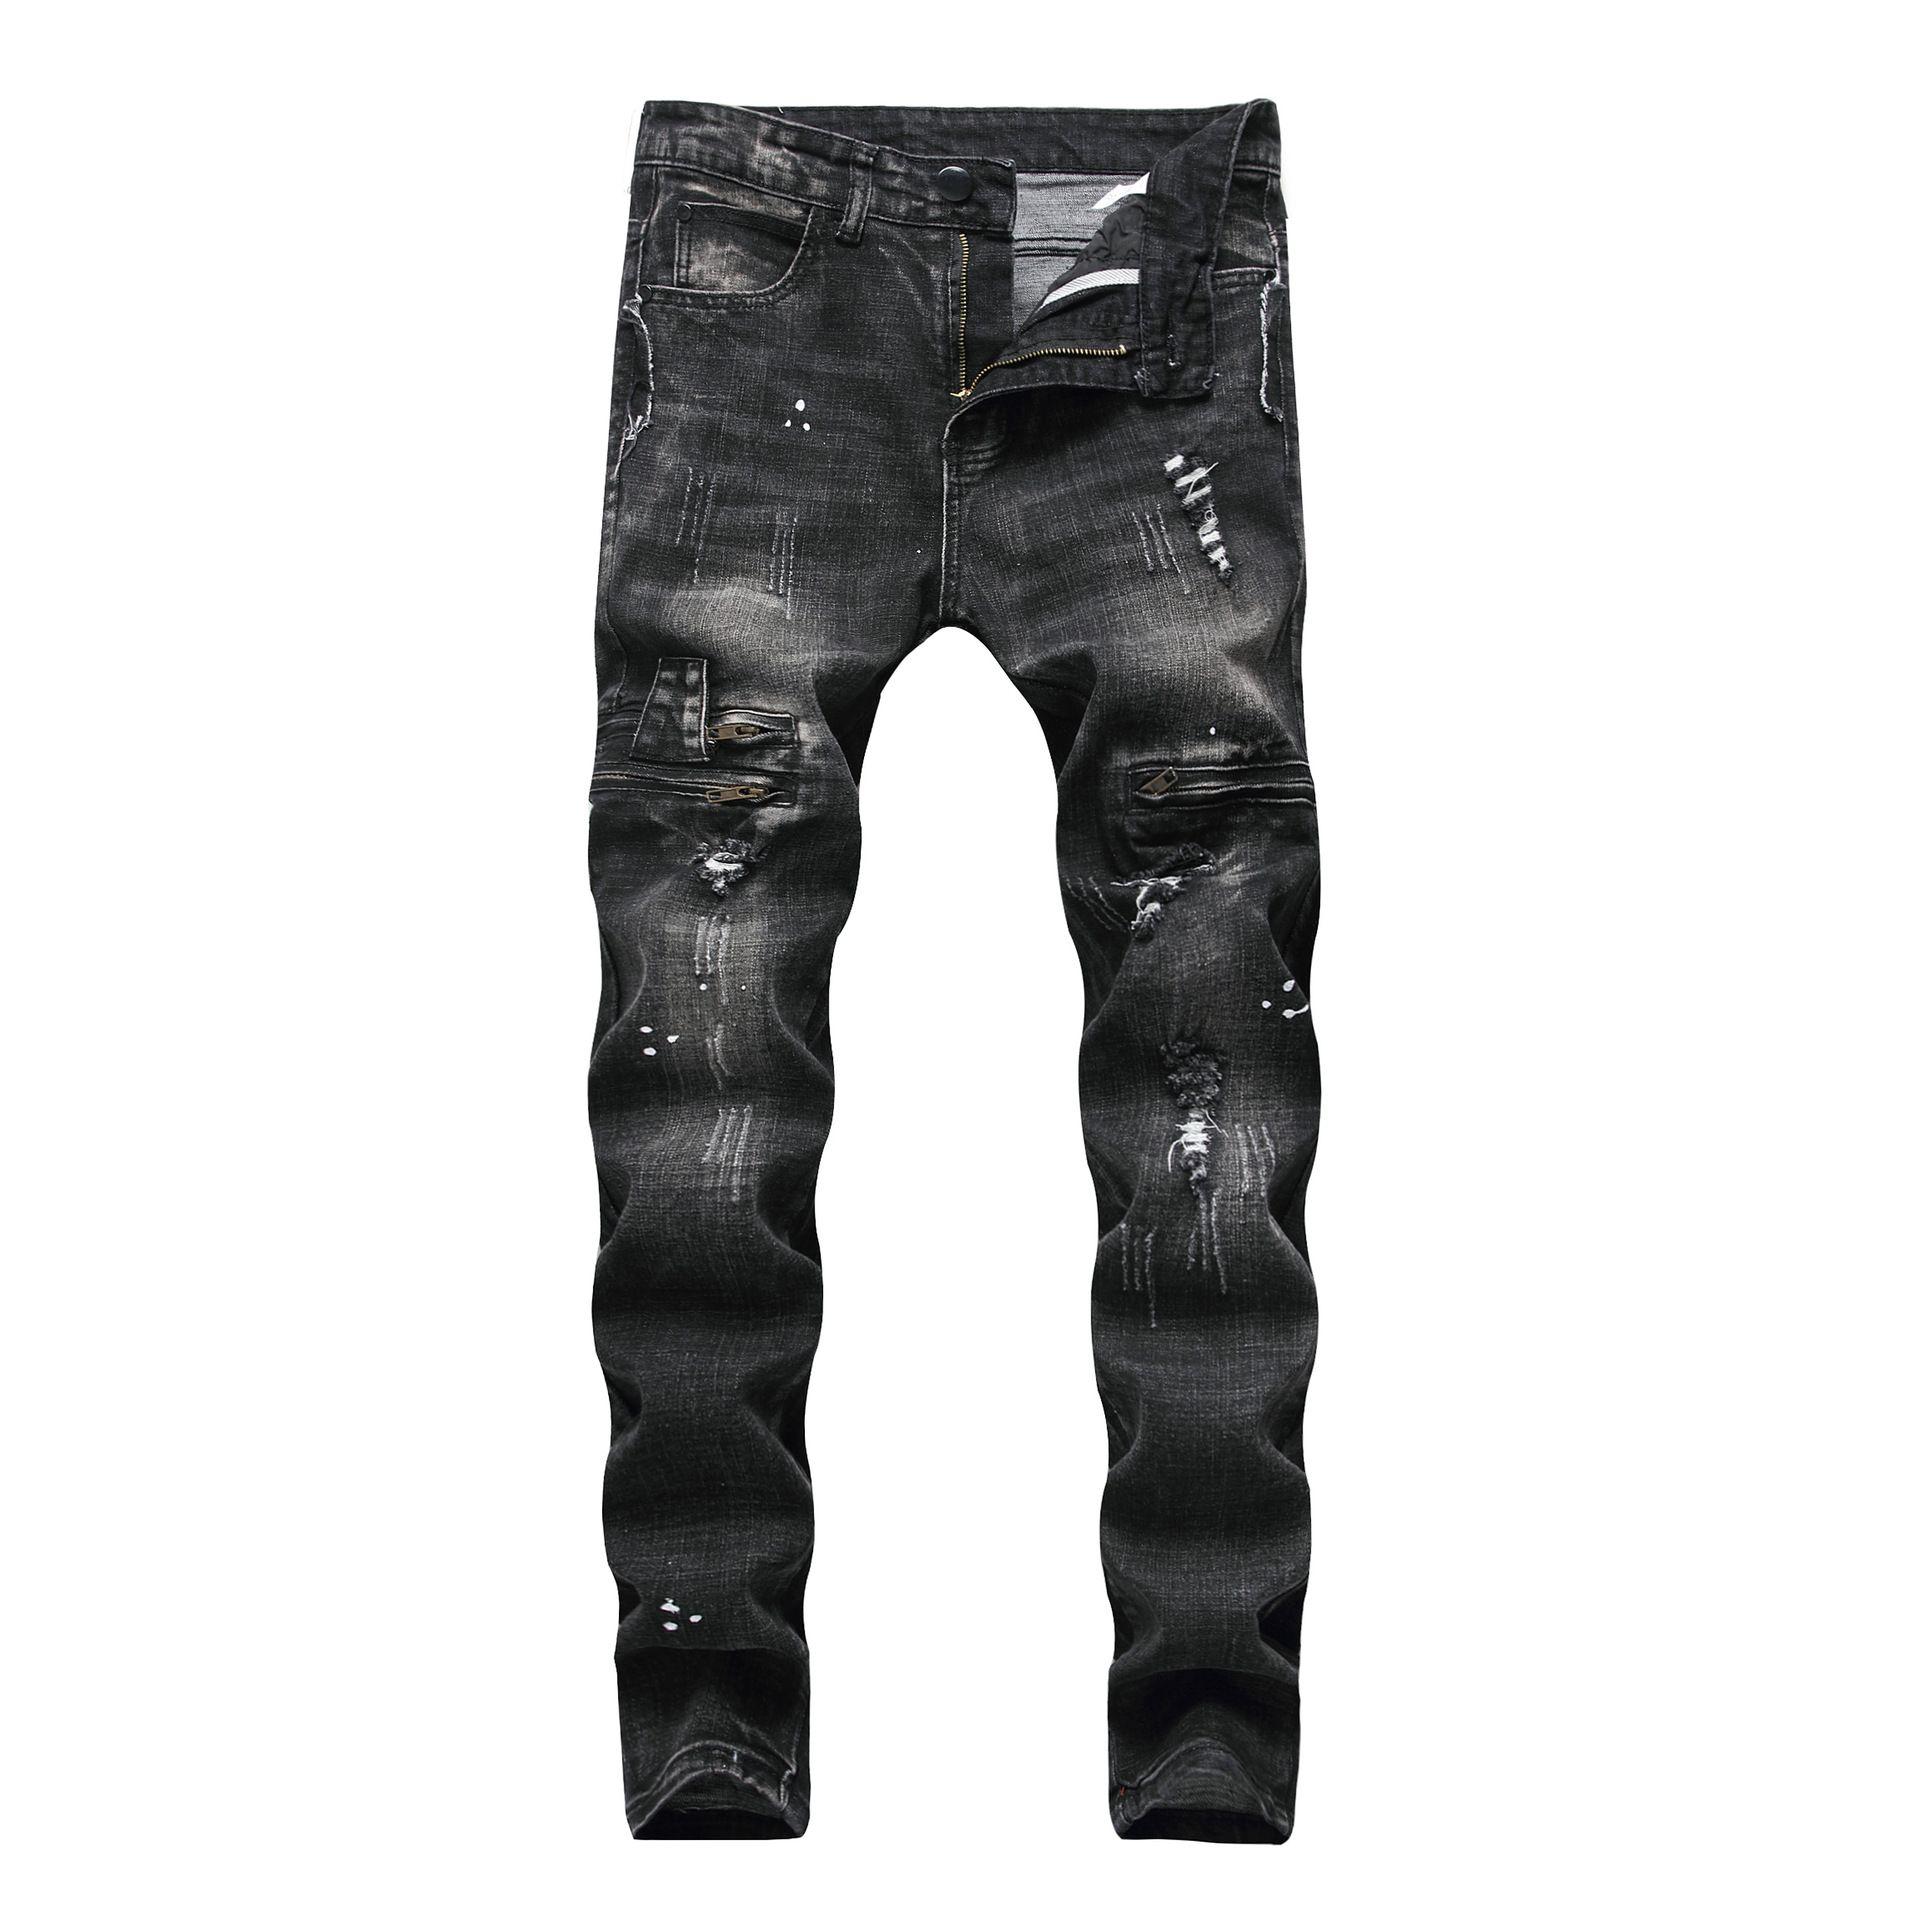 Ripped Men Jeans Size 28-42 Fashion Black Men Skinny Distressed Denim Jeans With Holes Destroyed Brand Designer Jean Pants J180708